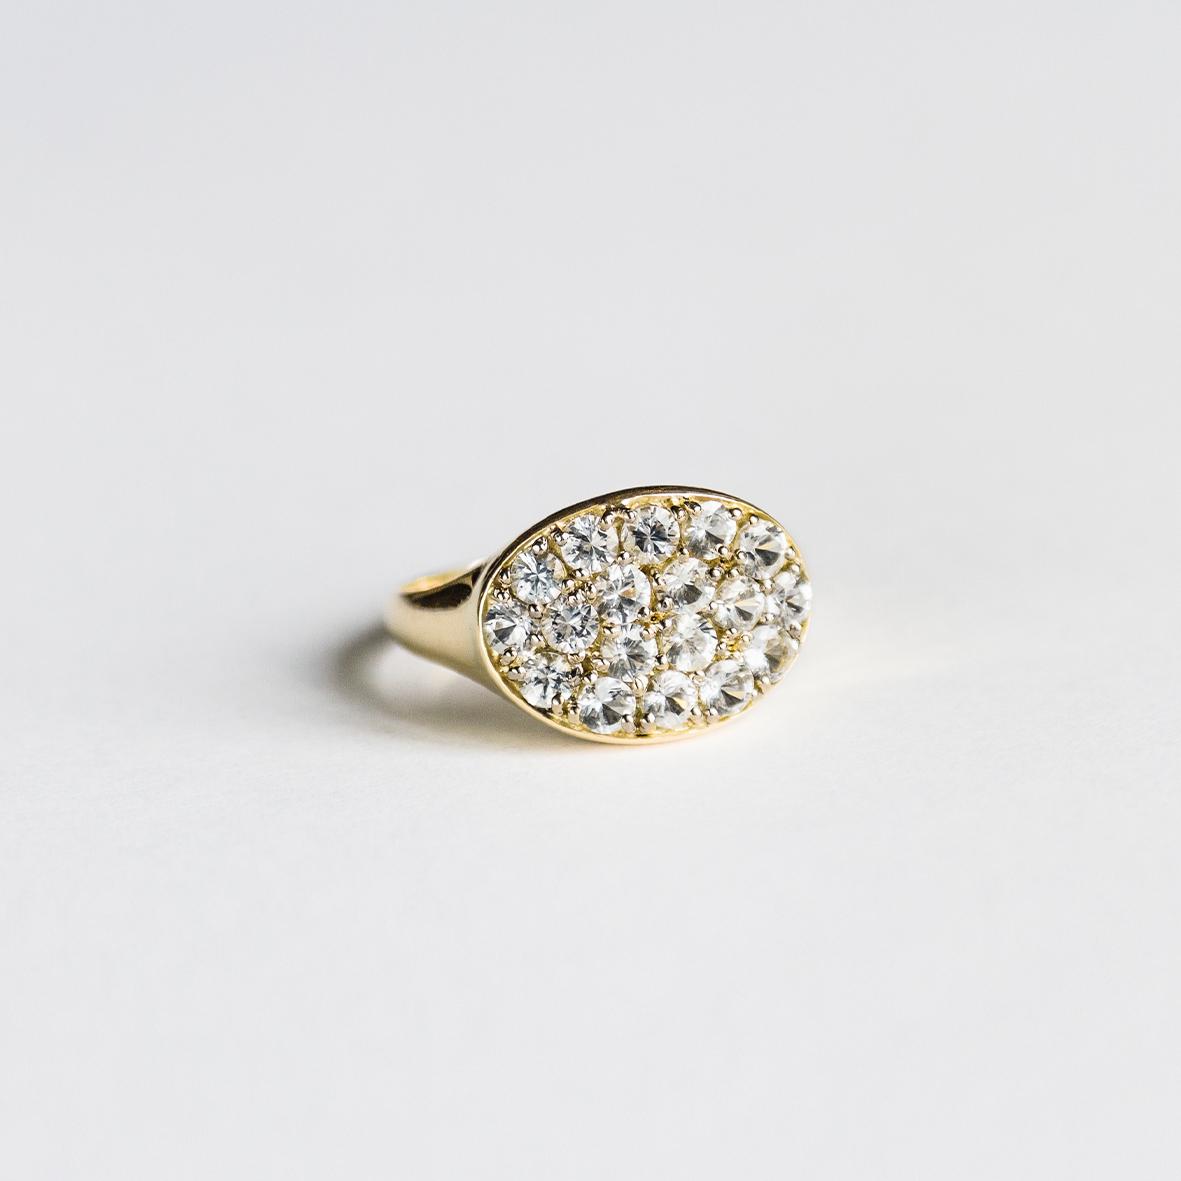 1. OONA_lotus_ficha1_signet horizontal sapphire ring